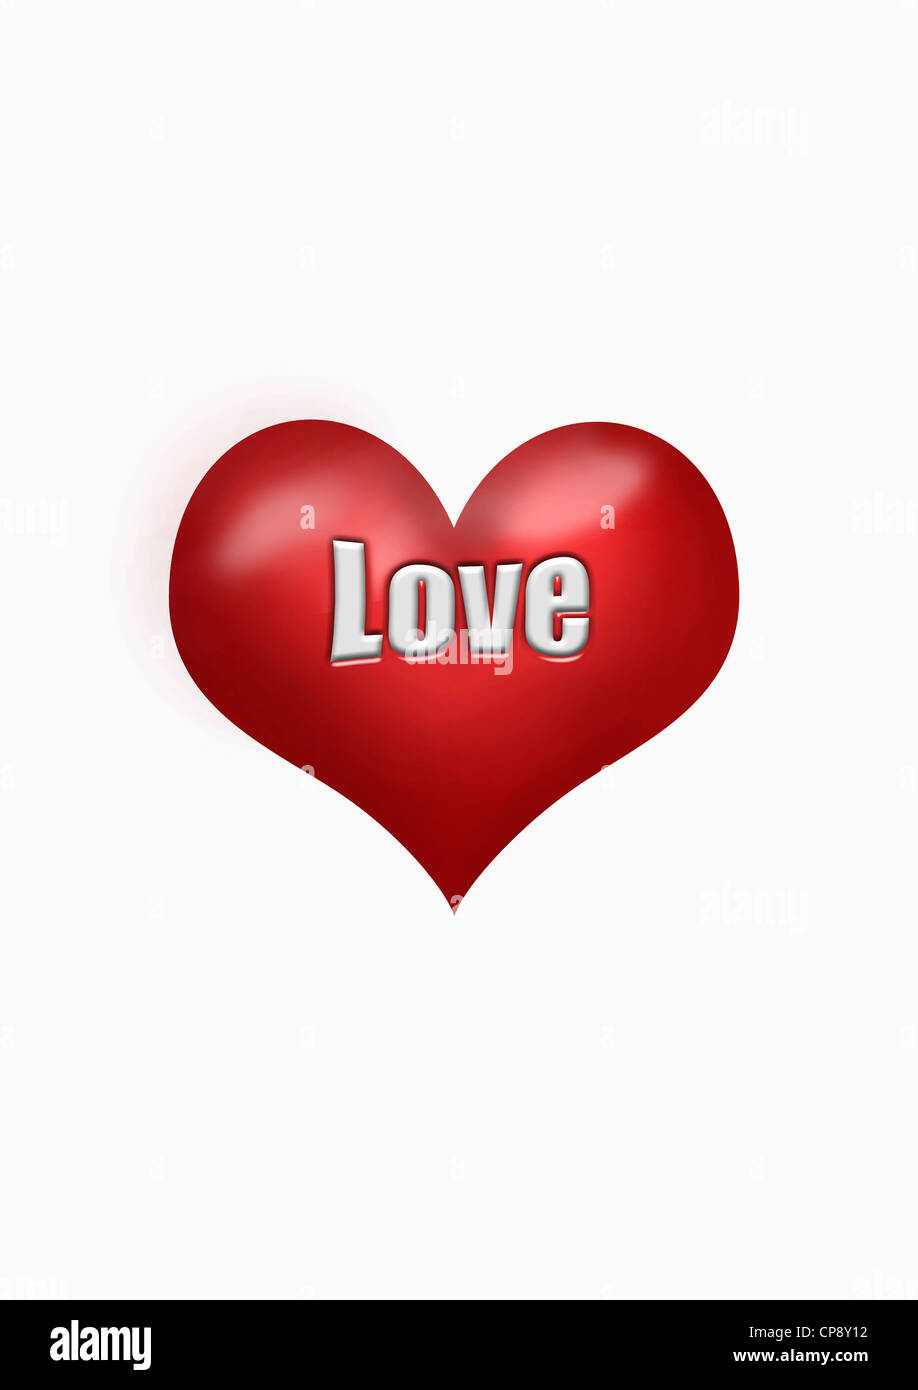 Heart Symbol Stock Photos & Heart Symbol Stock Images - Alamy